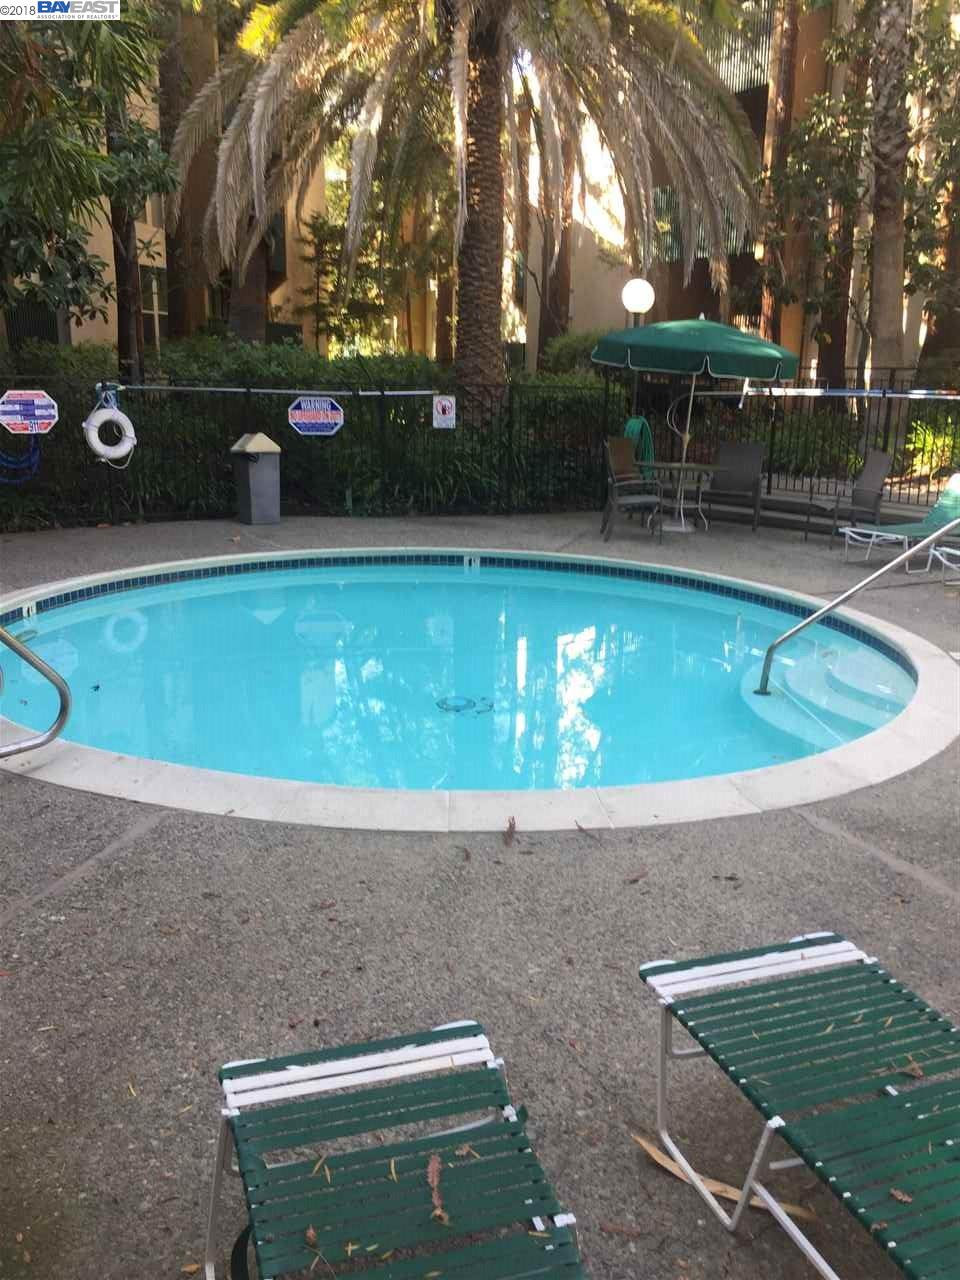 Additional photo for property listing at 155 Sharene Lane 155 Sharene Lane Walnut Creek, California 94596 United States